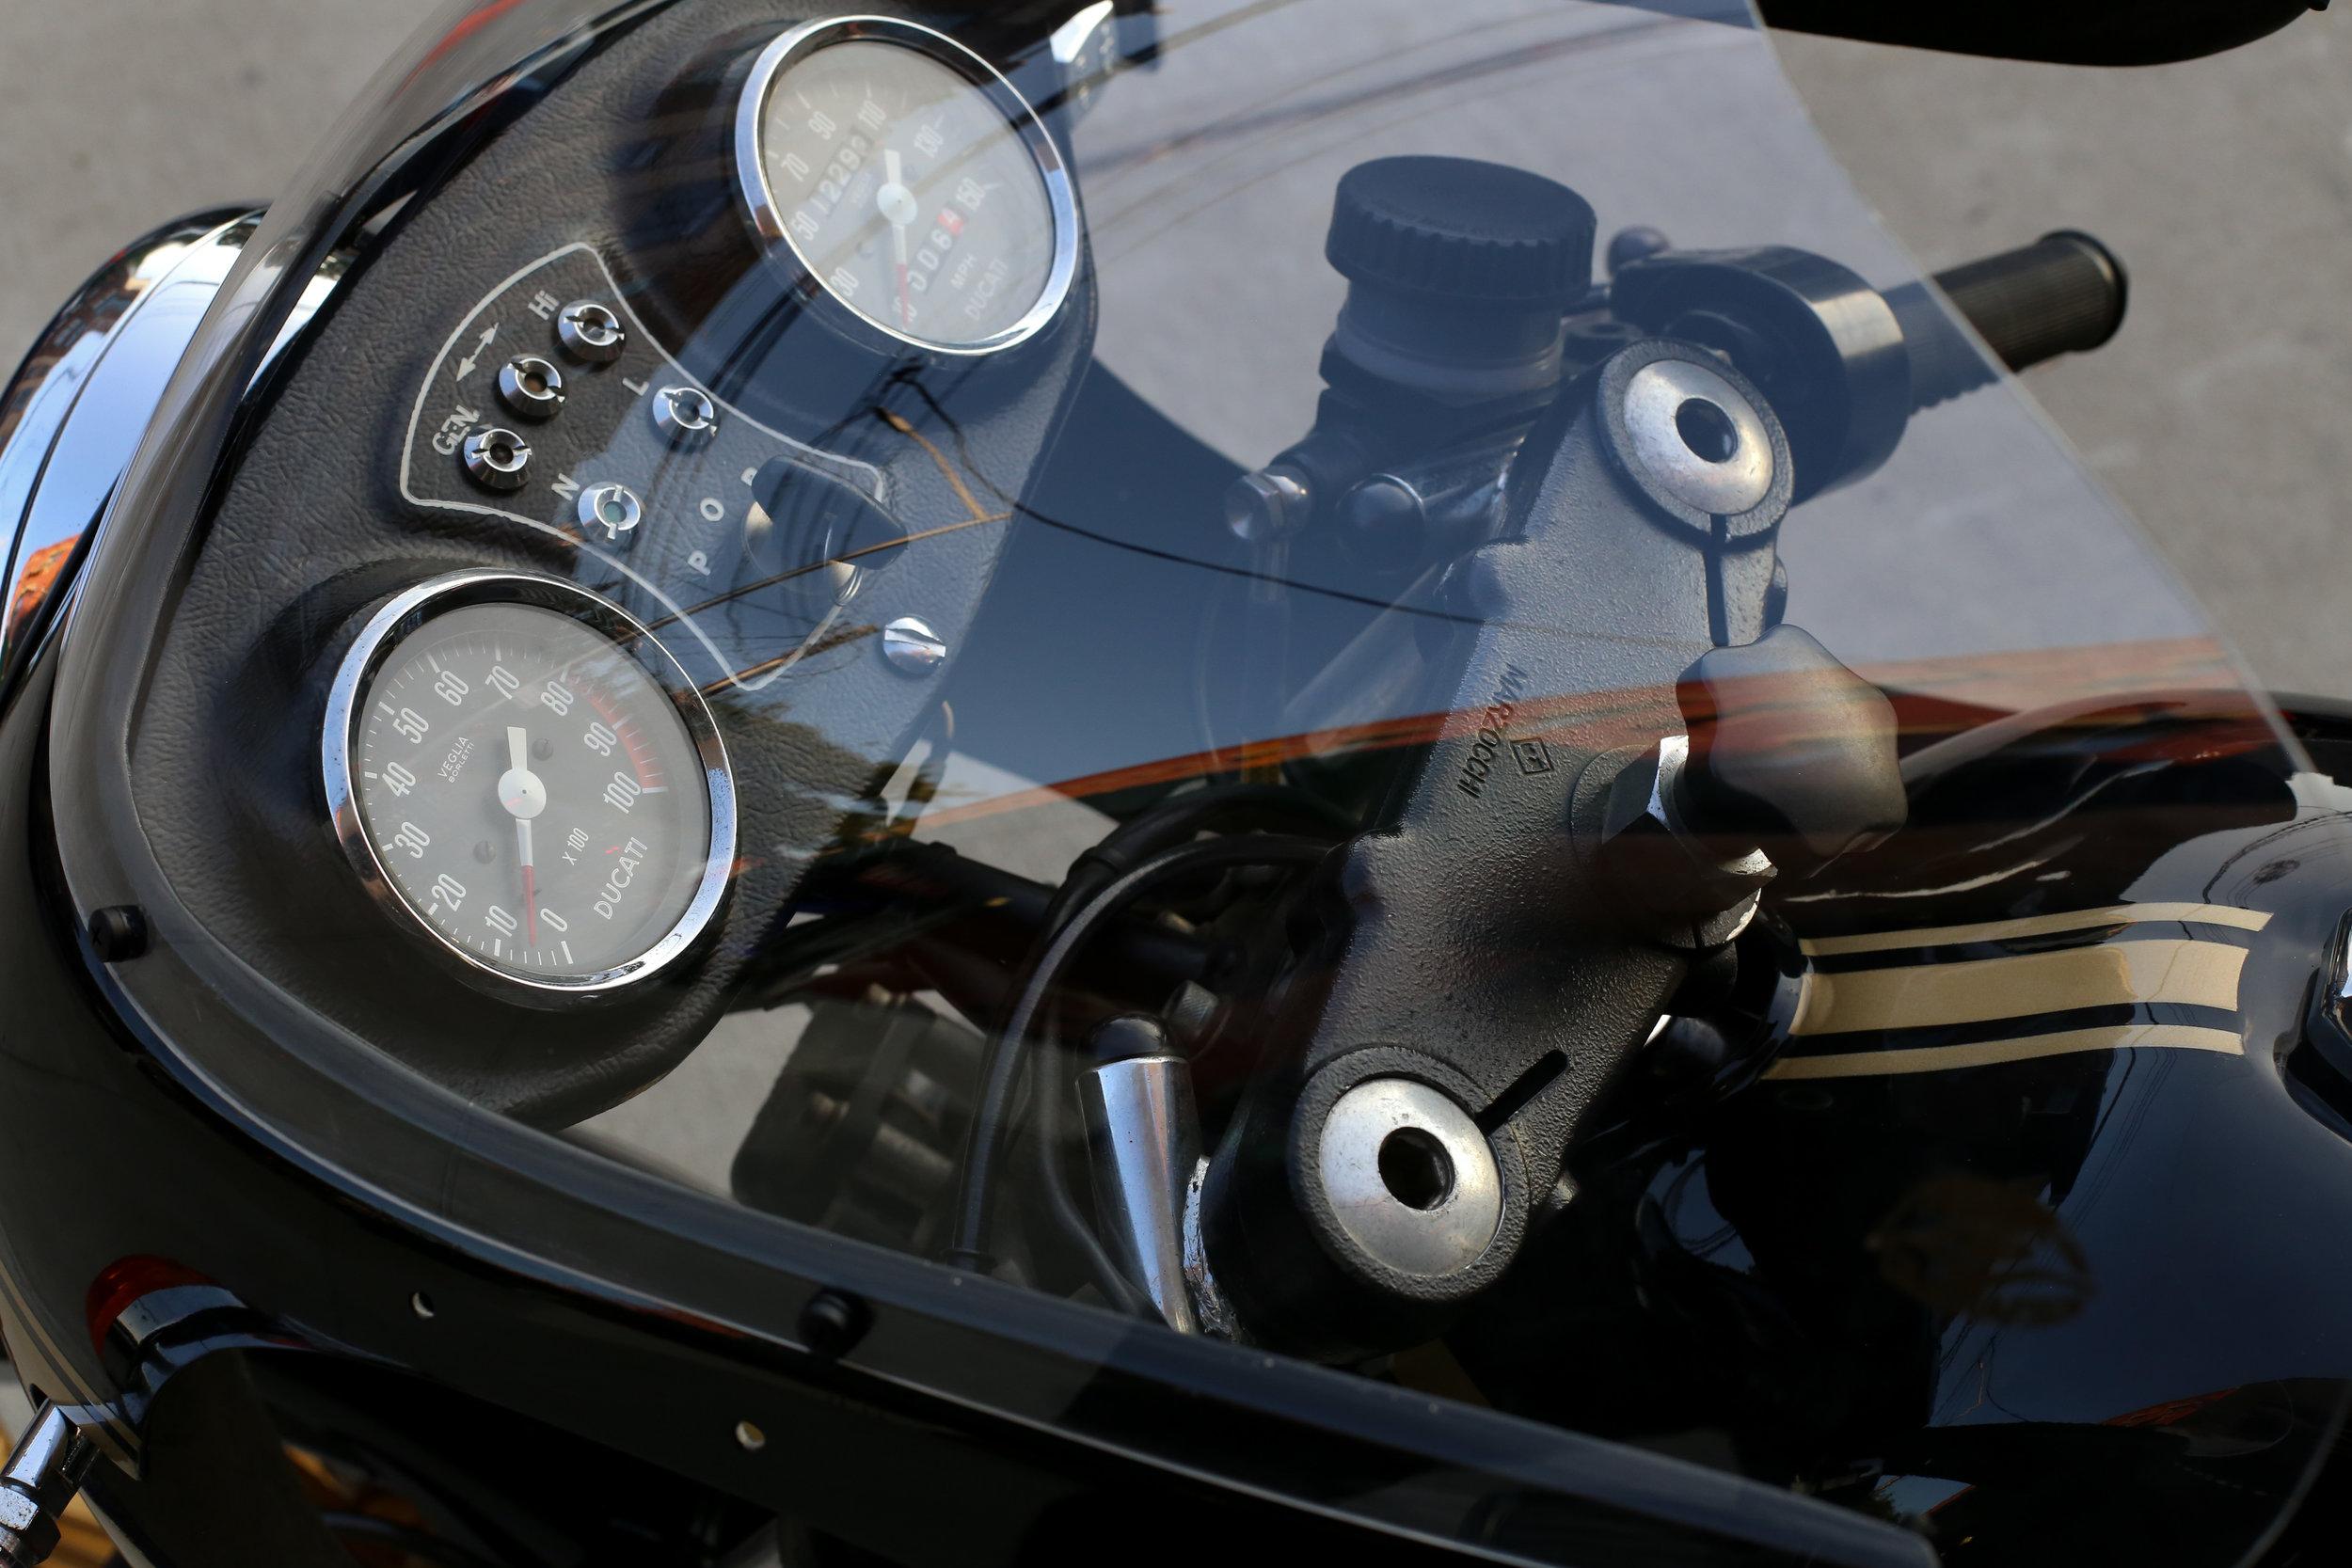 1980 Ducati 900SS windshield